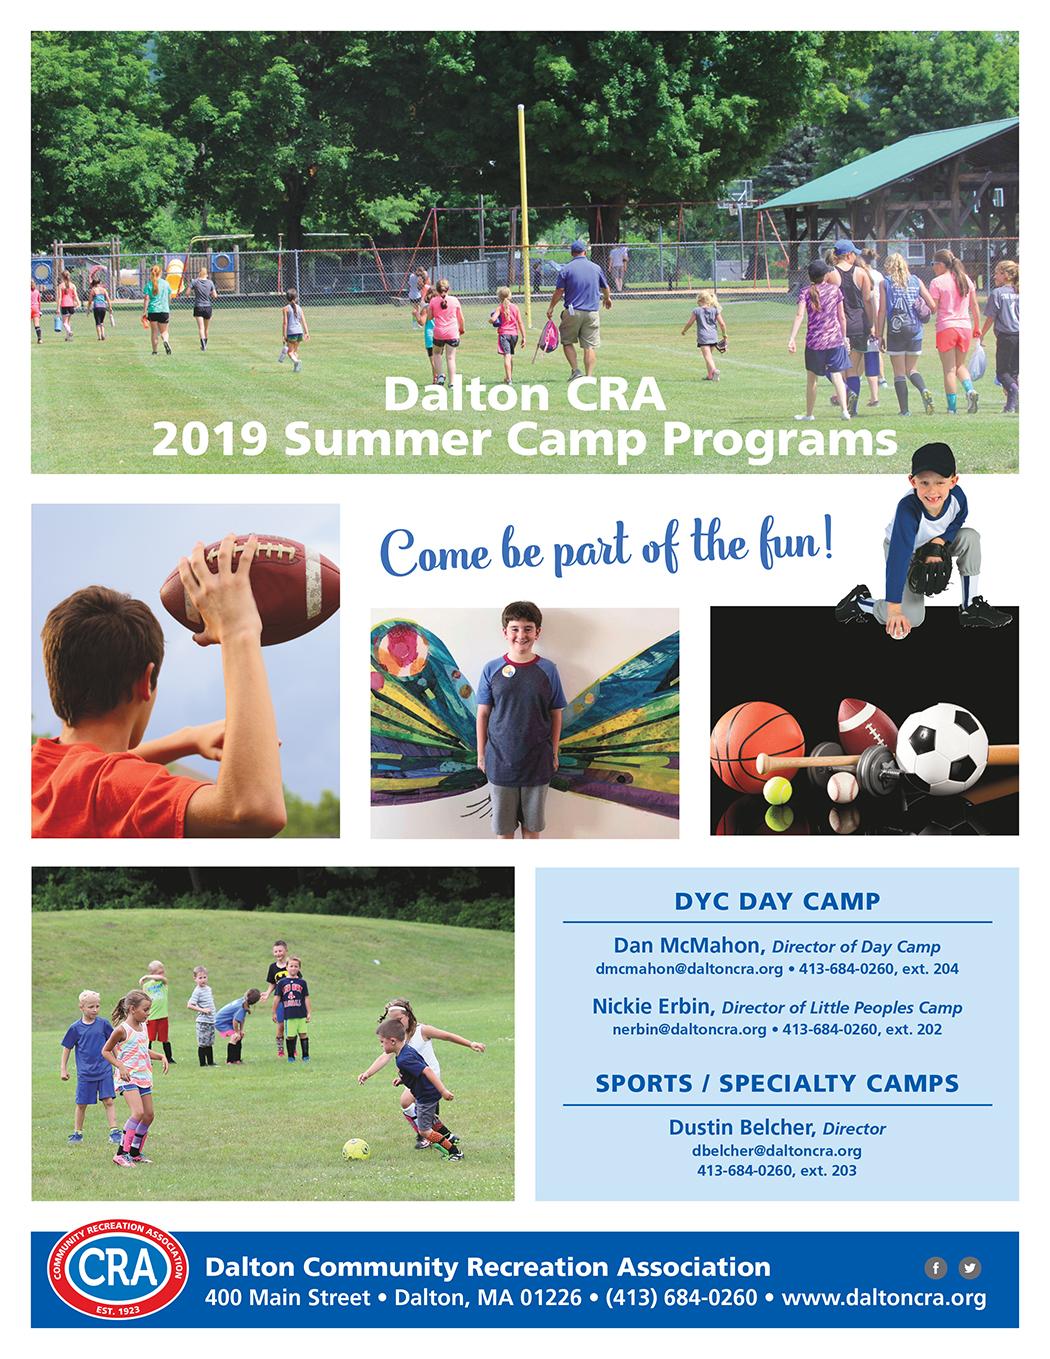 Youth Camps - Dalton CRA